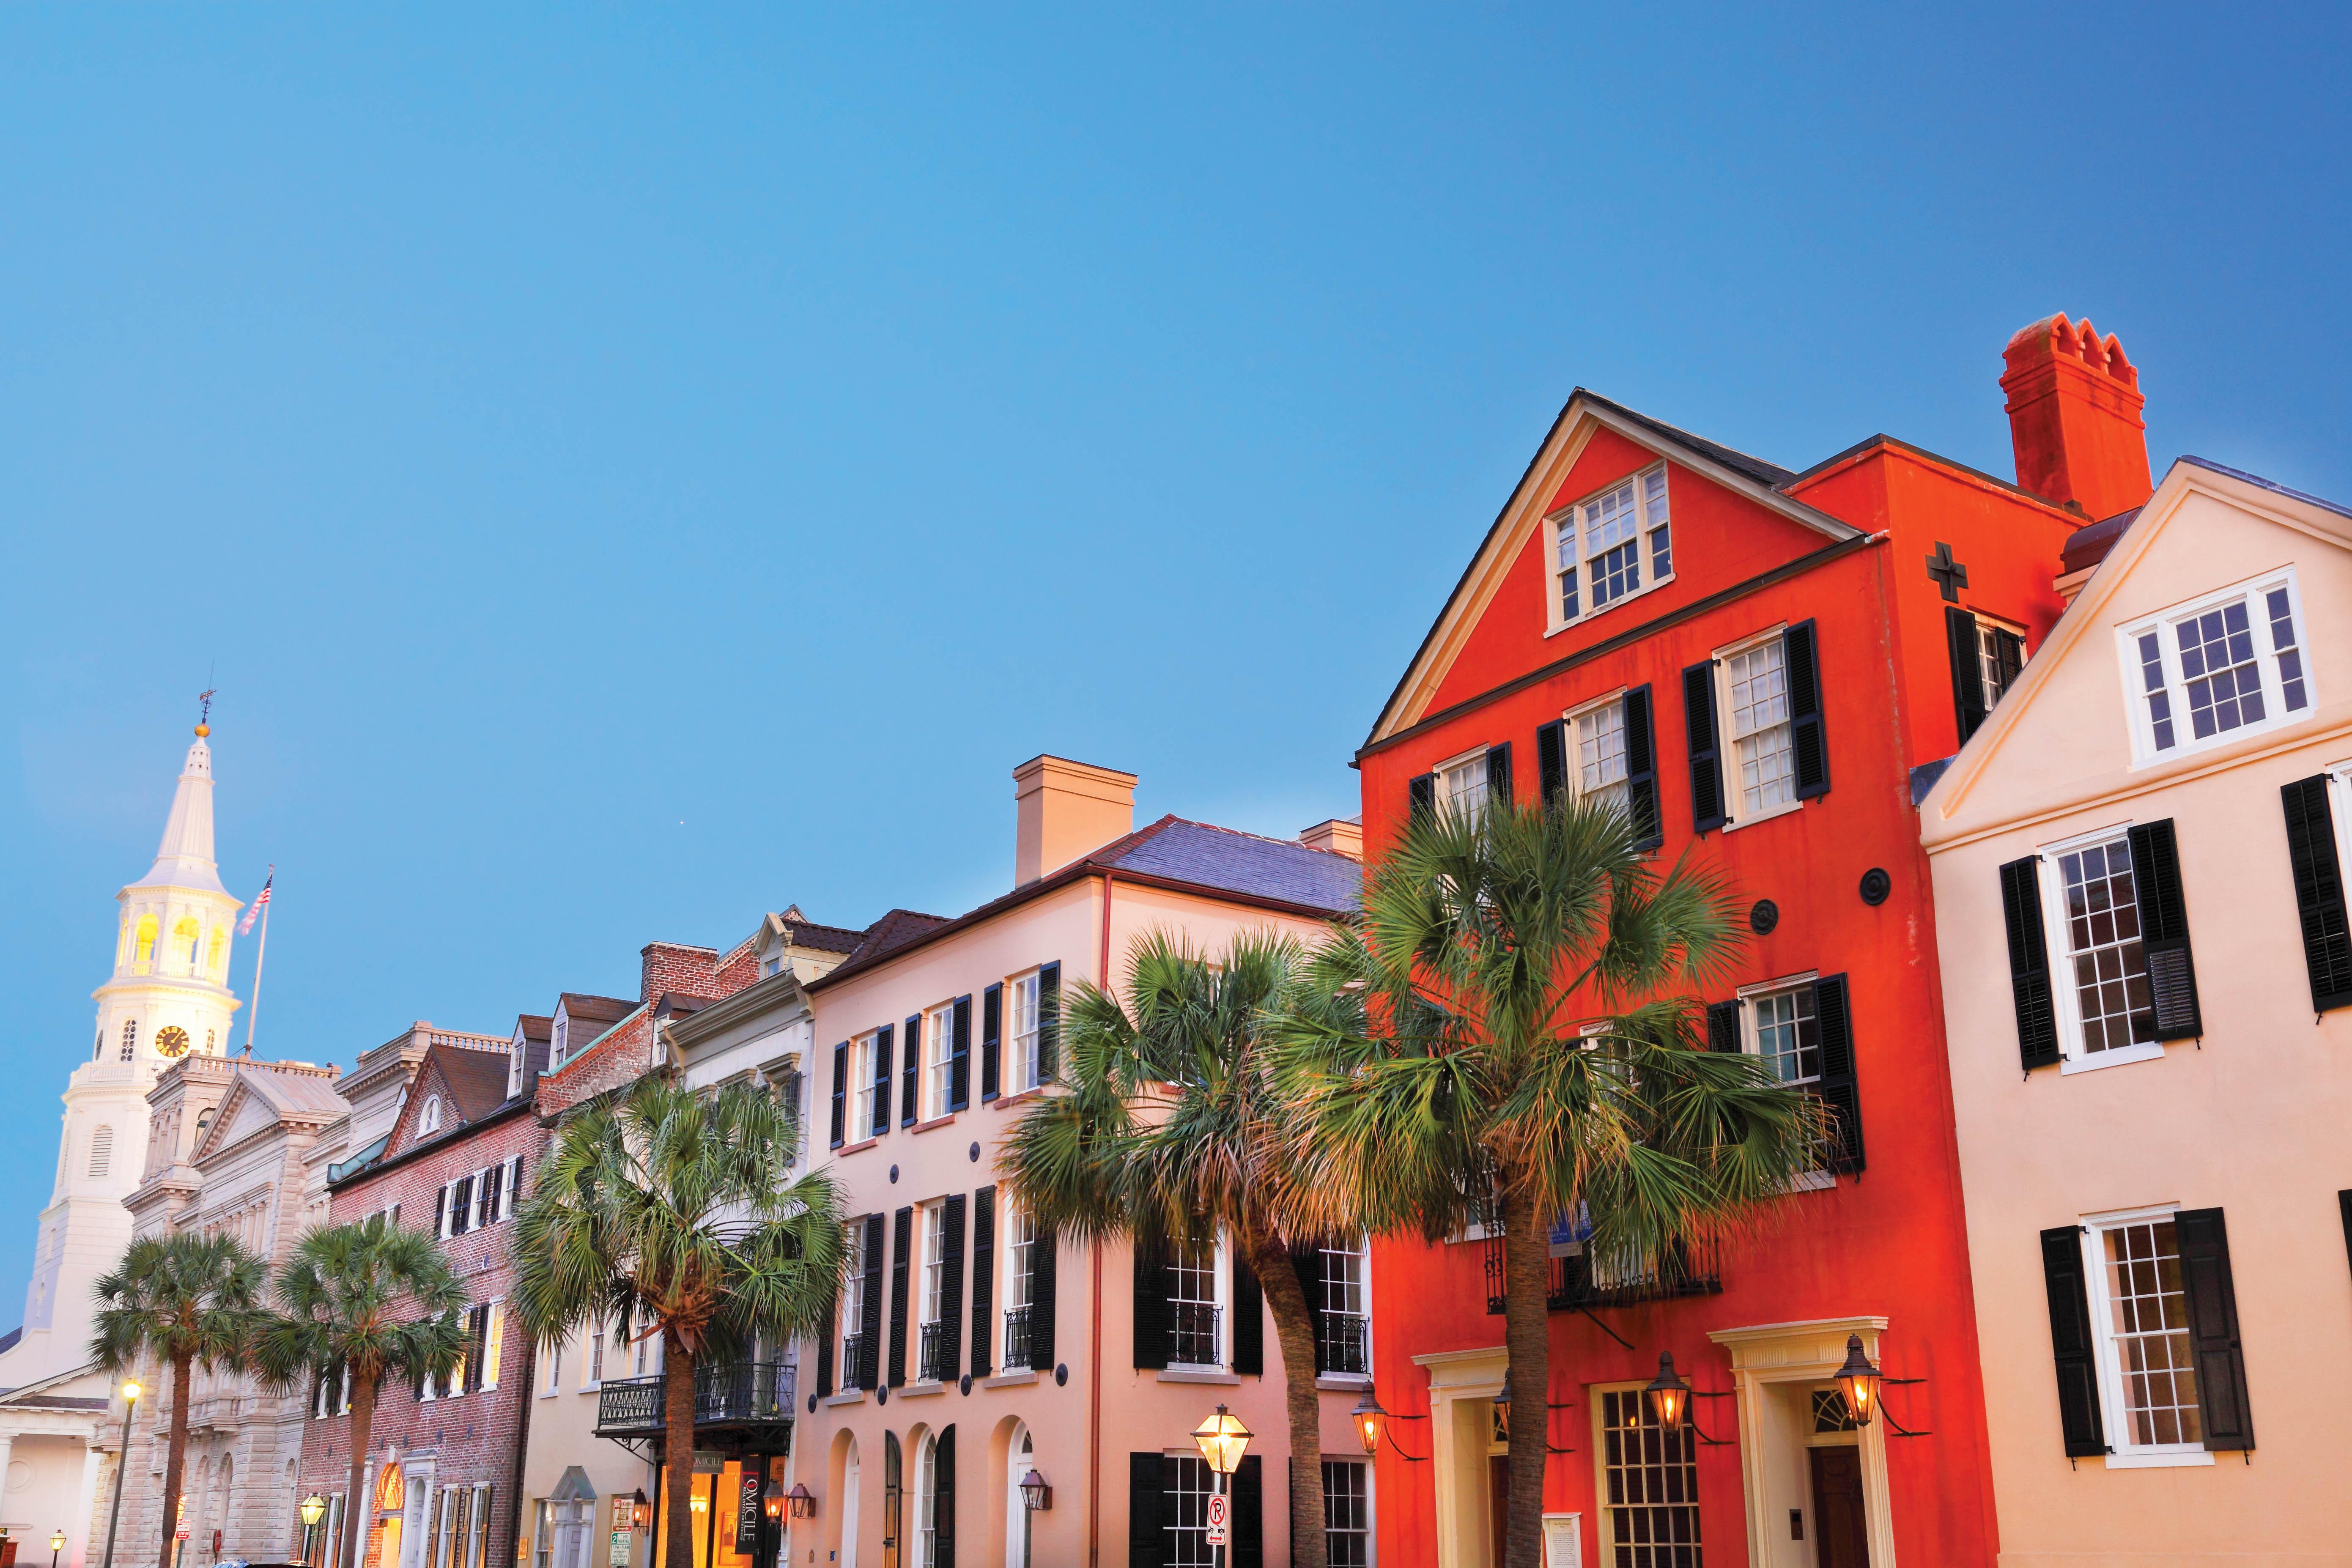 THE 10 BEST BBQ Restaurants in Charleston - TripAdvisor